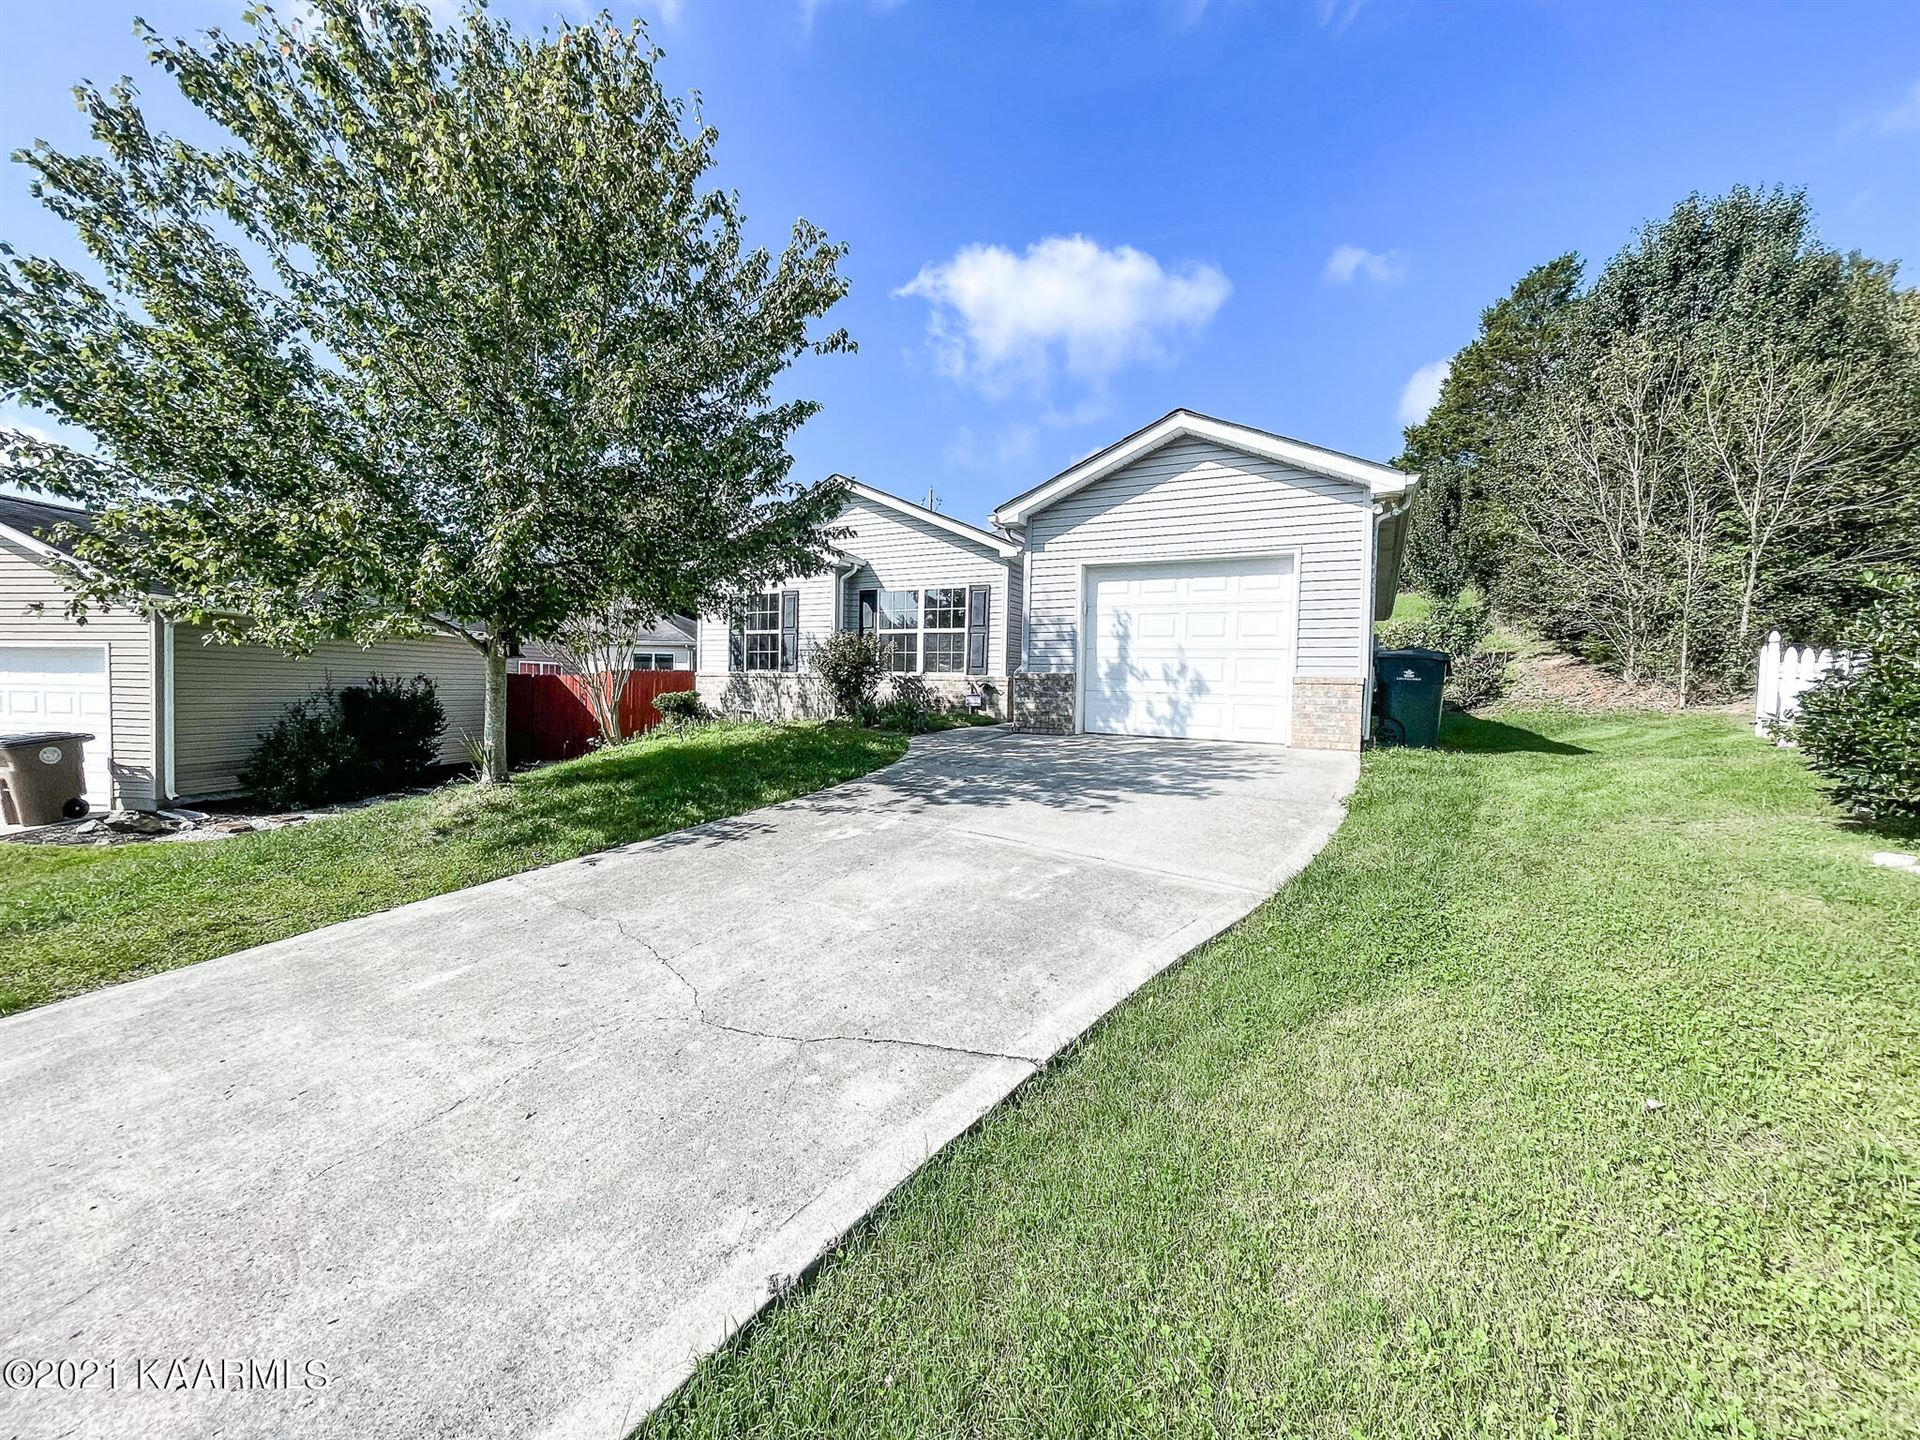 Photo of 6405 Granite Hill Lane, Knoxville, TN 37923 (MLS # 1170829)